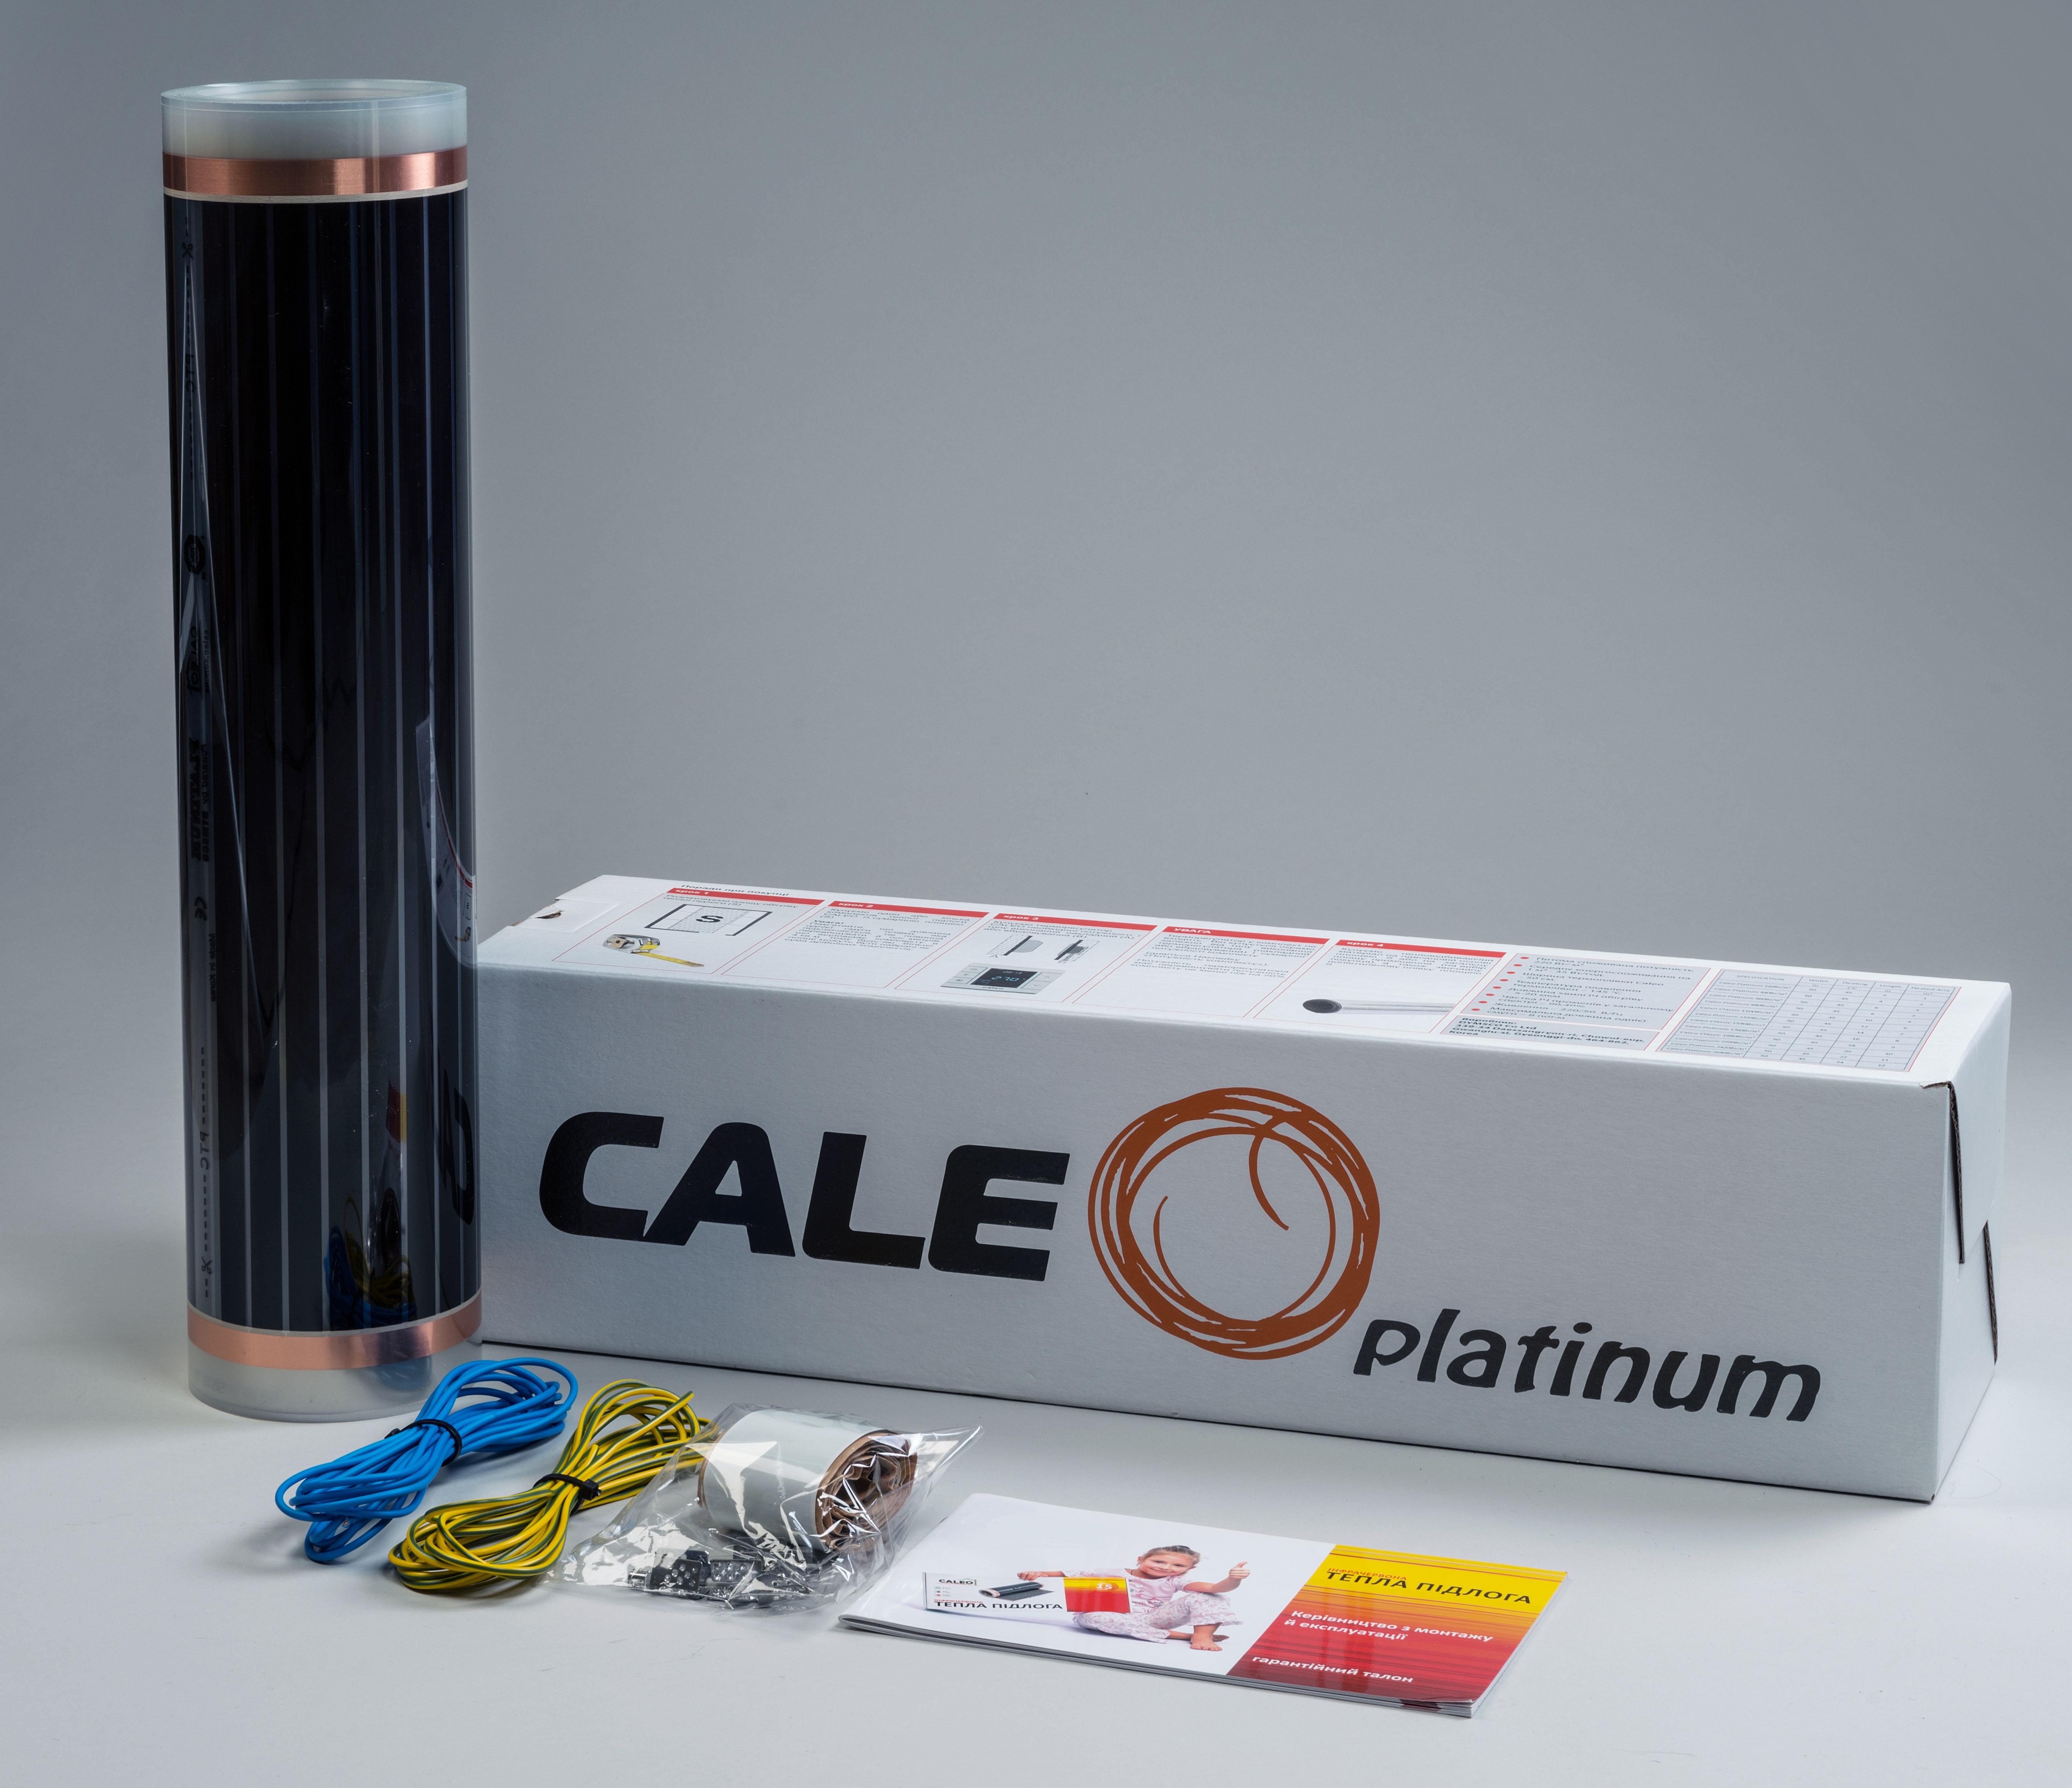 caleo (южная корея) Caleo Platinum 220-0,5-8.0 (8 м2)